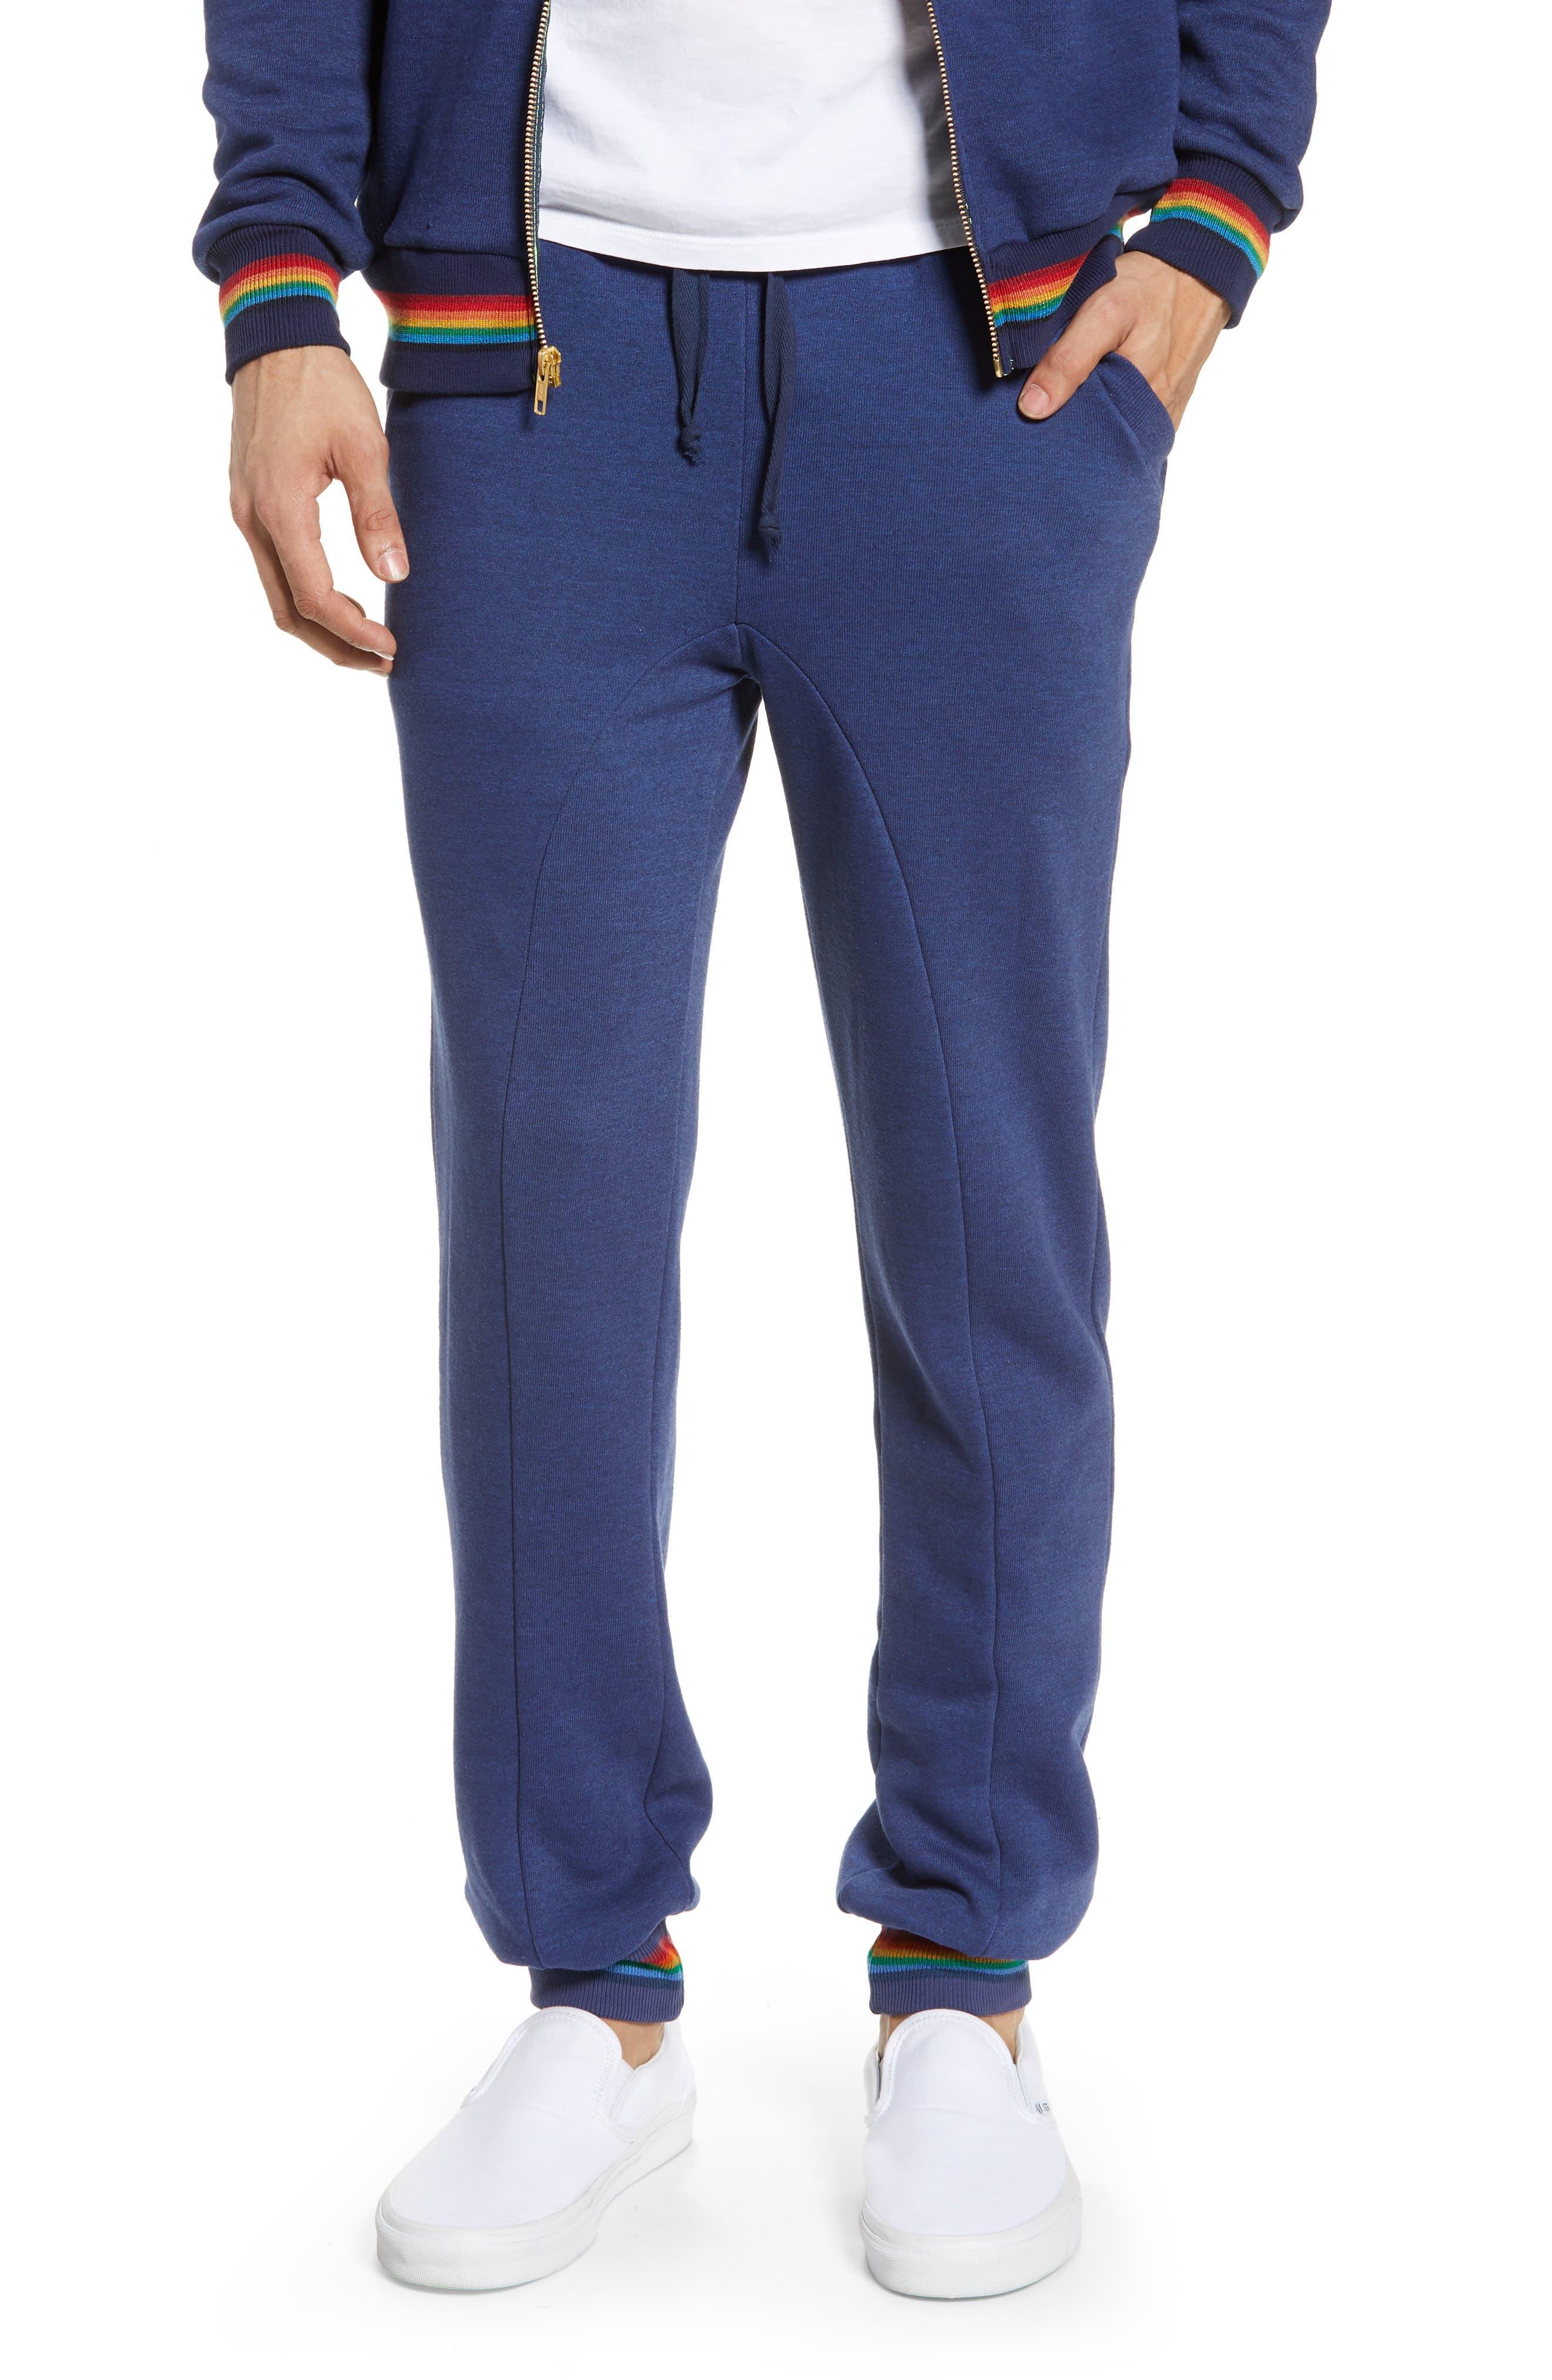 Aviator Nation Prism Slim Fit Sweatpants, Blue